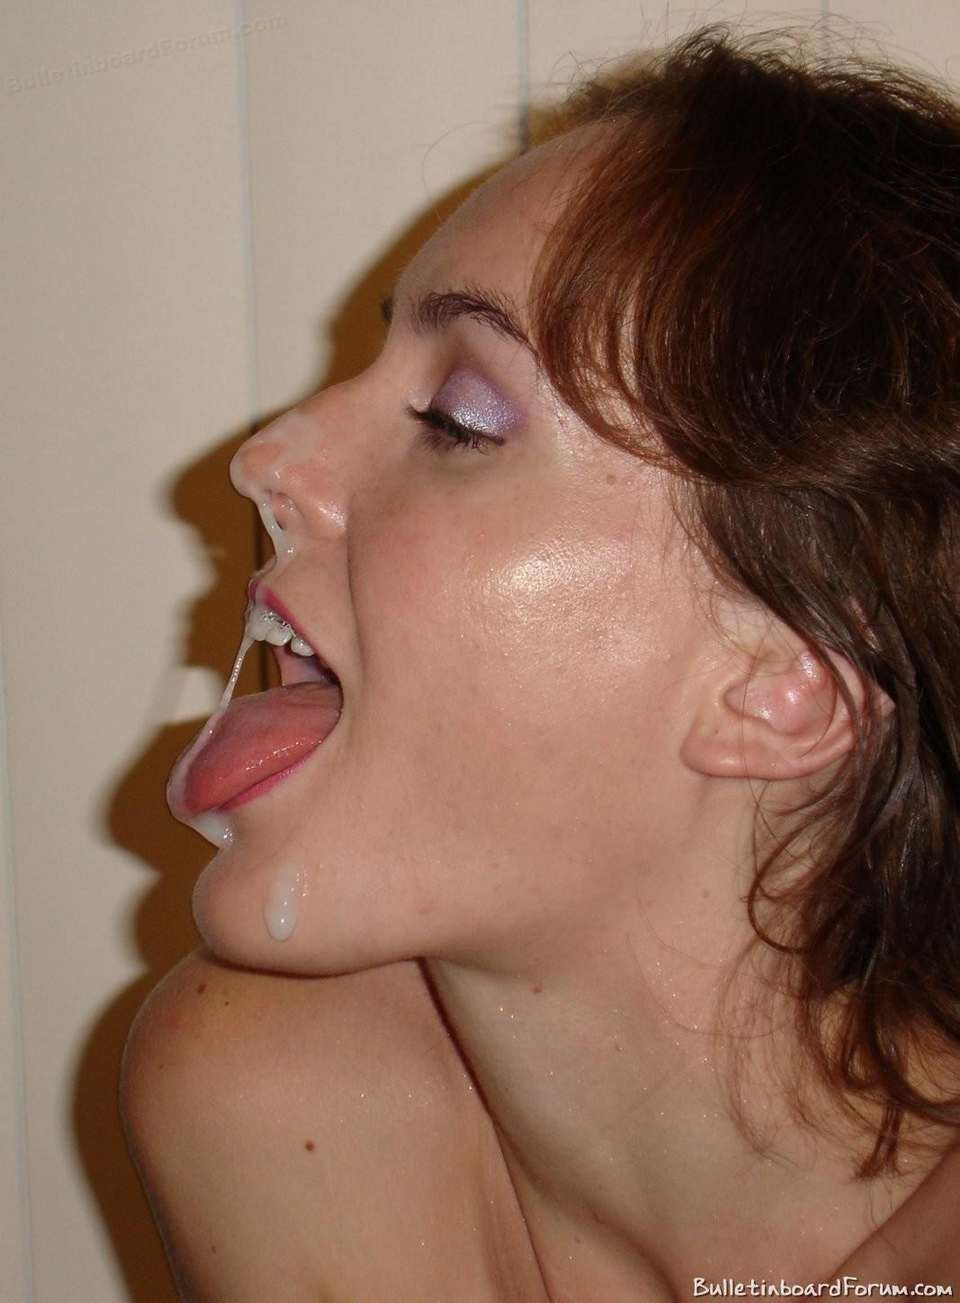 sperme visage bouche (15)